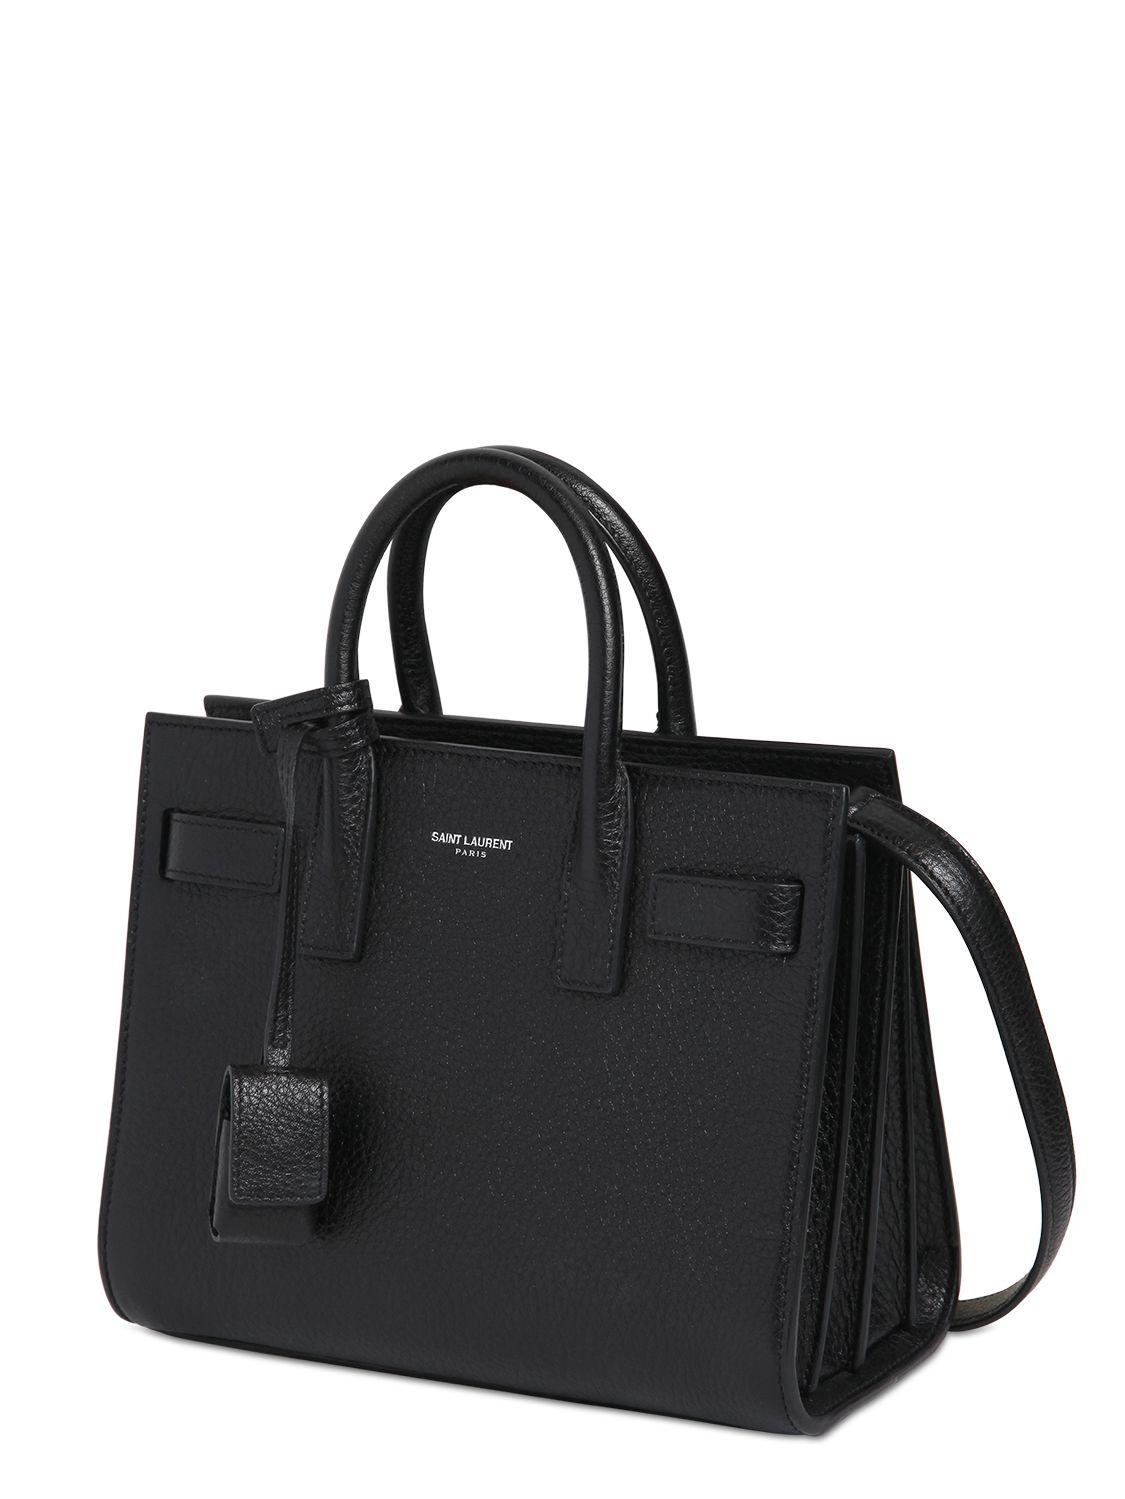 Yves Saint Laurent Nano Sac De Jour Carryall Bag Ysl Sac